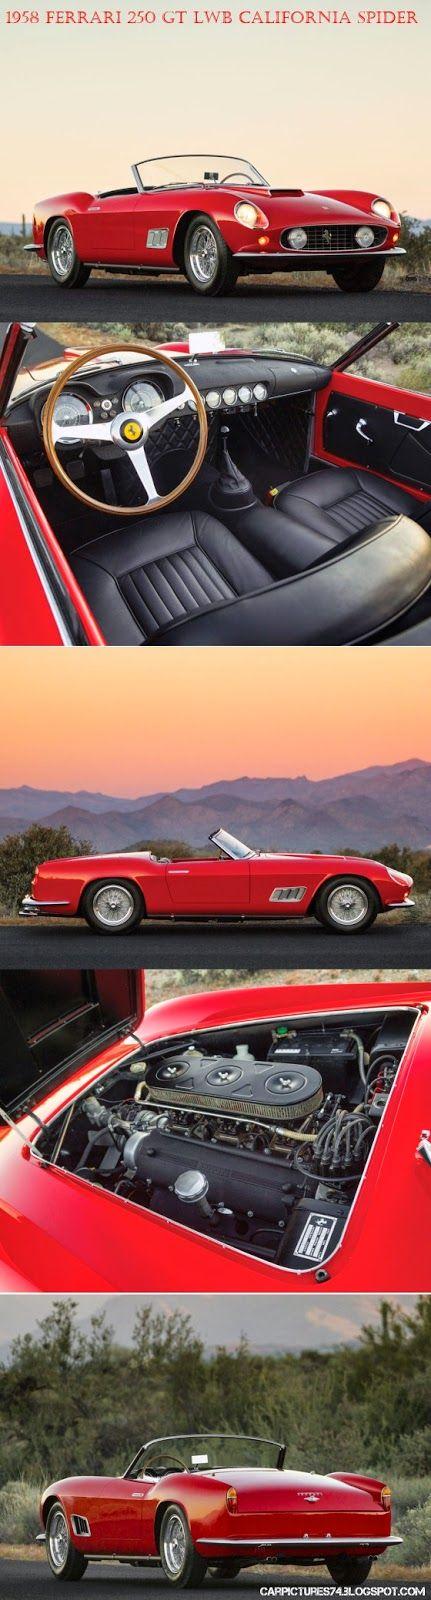 Car Pictures: 1958 Ferrari 250 GT LWB California Spider by Scaglietti. Visit: http://carpictures74.blogspot.com/